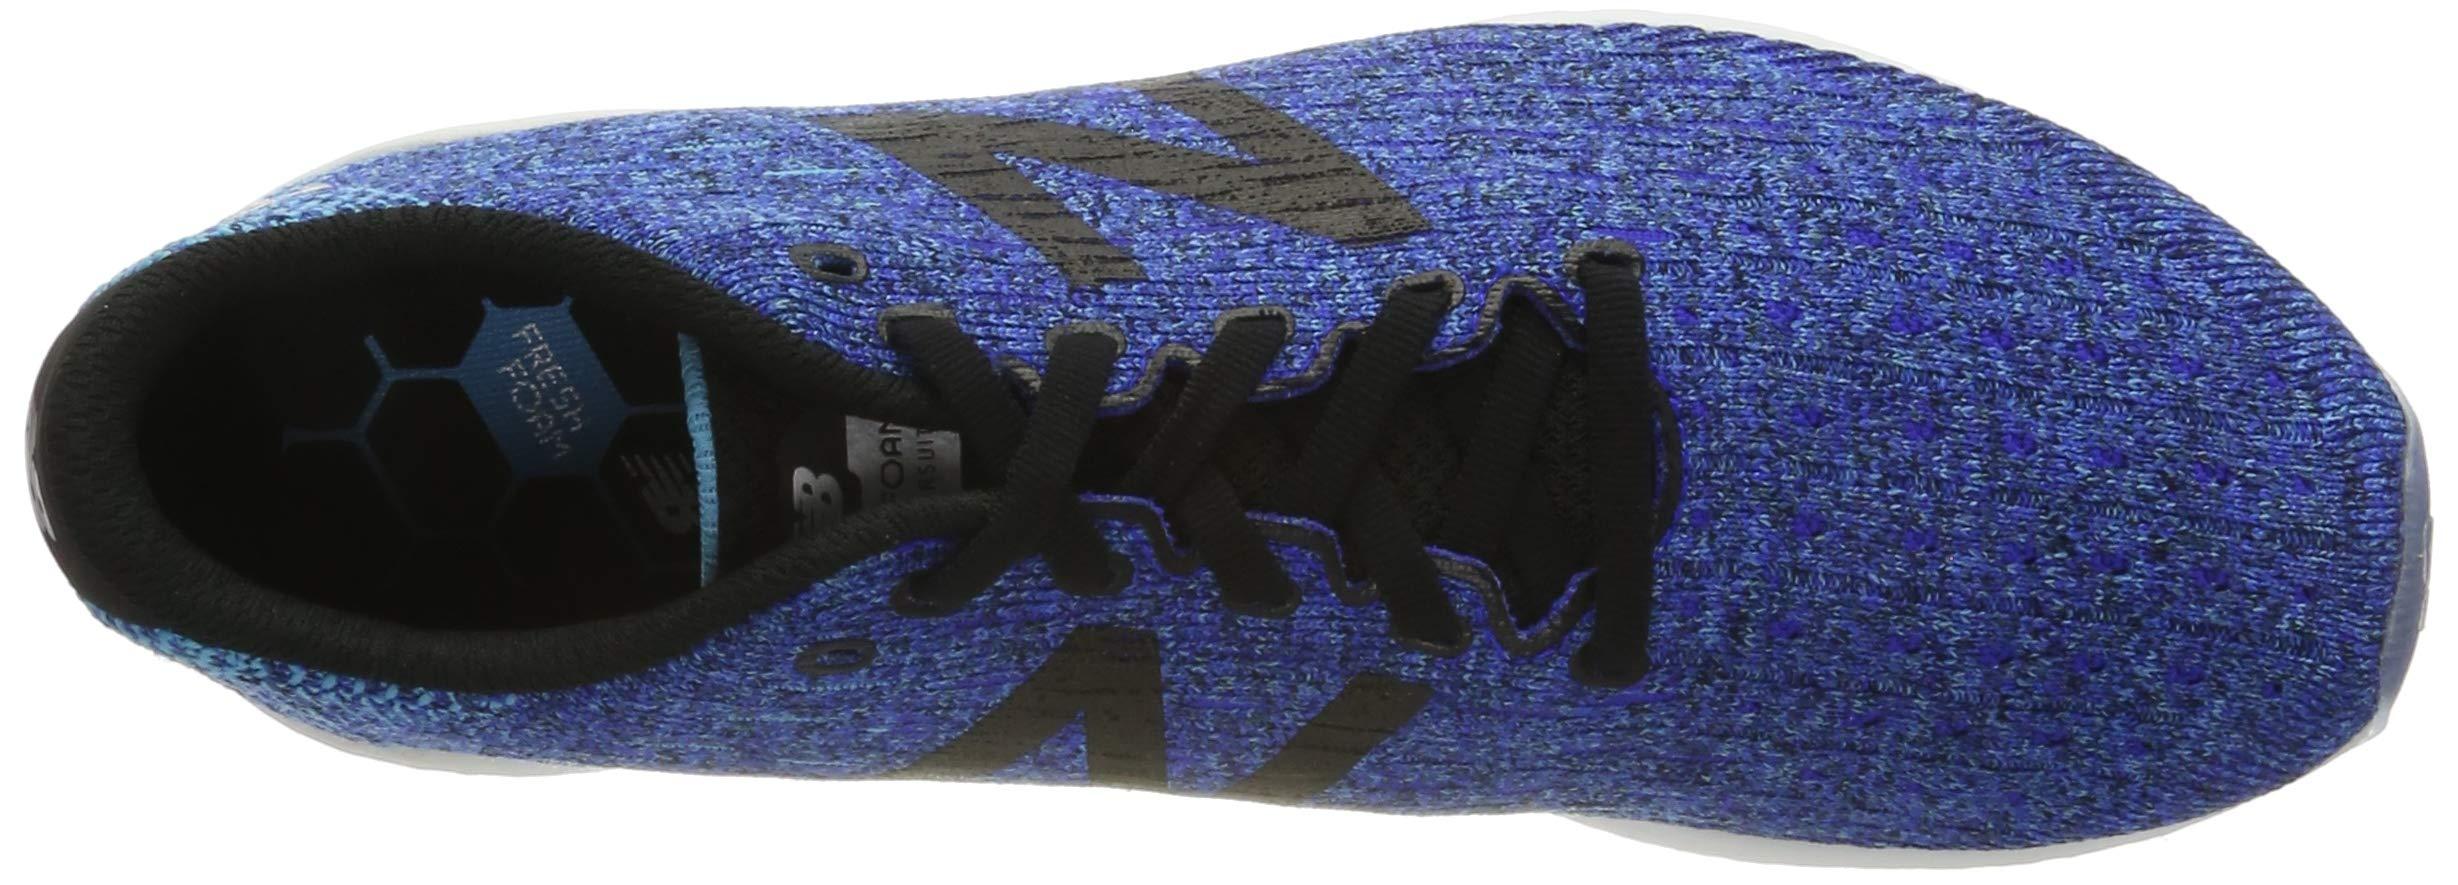 71DUIAf1fbL - New Balance Men's Zante Pursuit V1 Fresh Foam Running Shoe